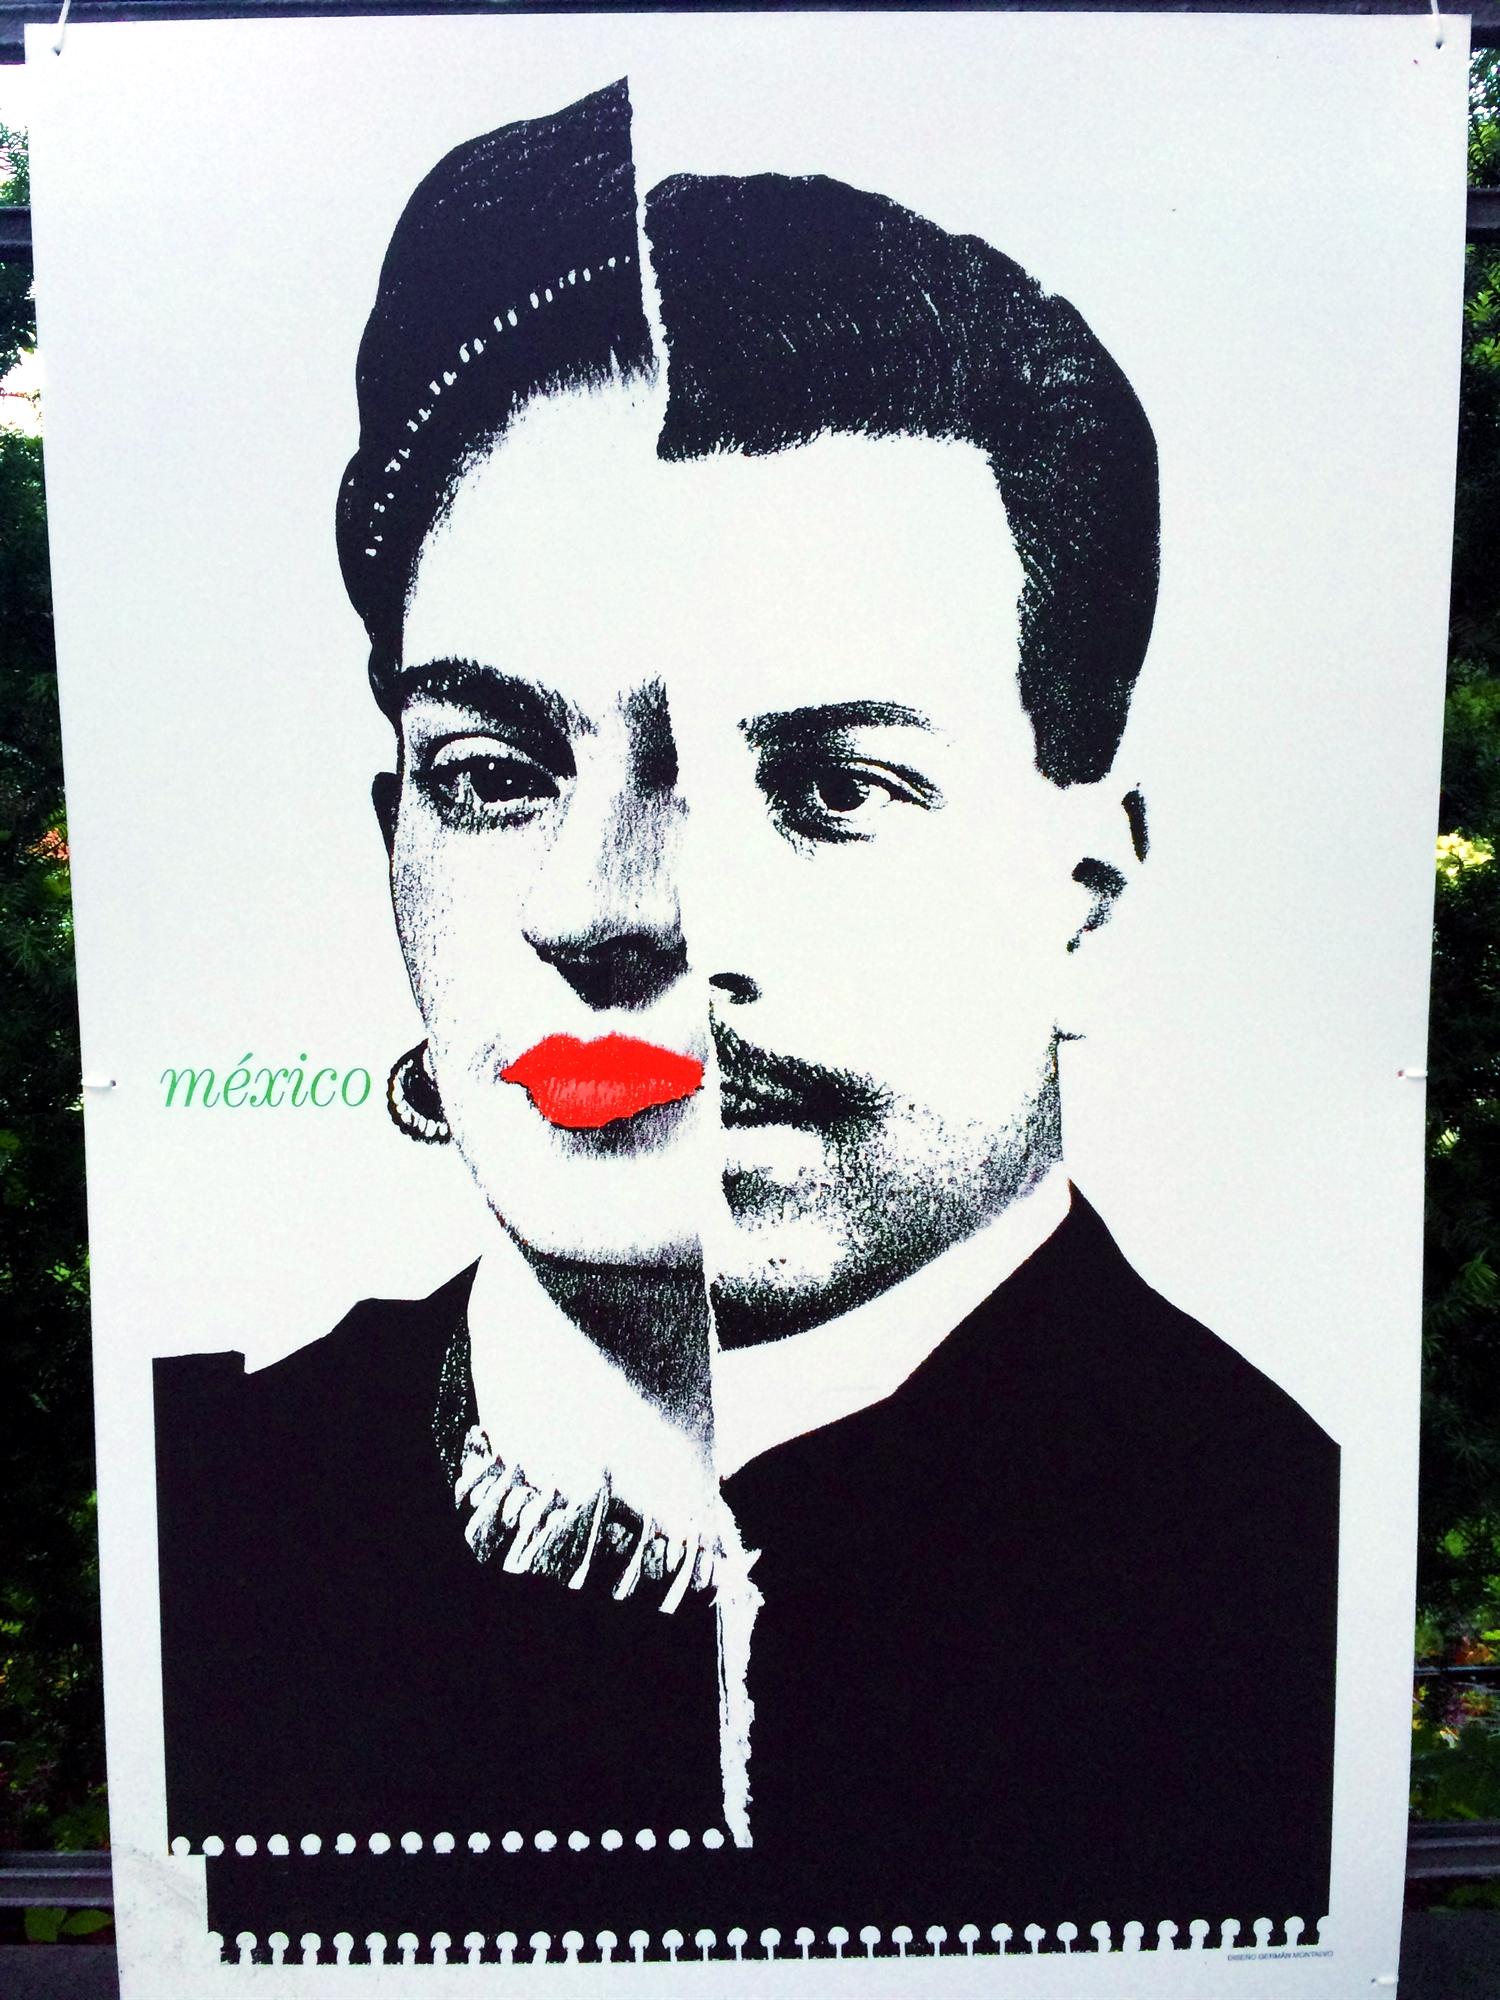 36 Mexican poster street art design plakat meksykanski projektowanie uzytkowe sztuka uliczna FORelementspl